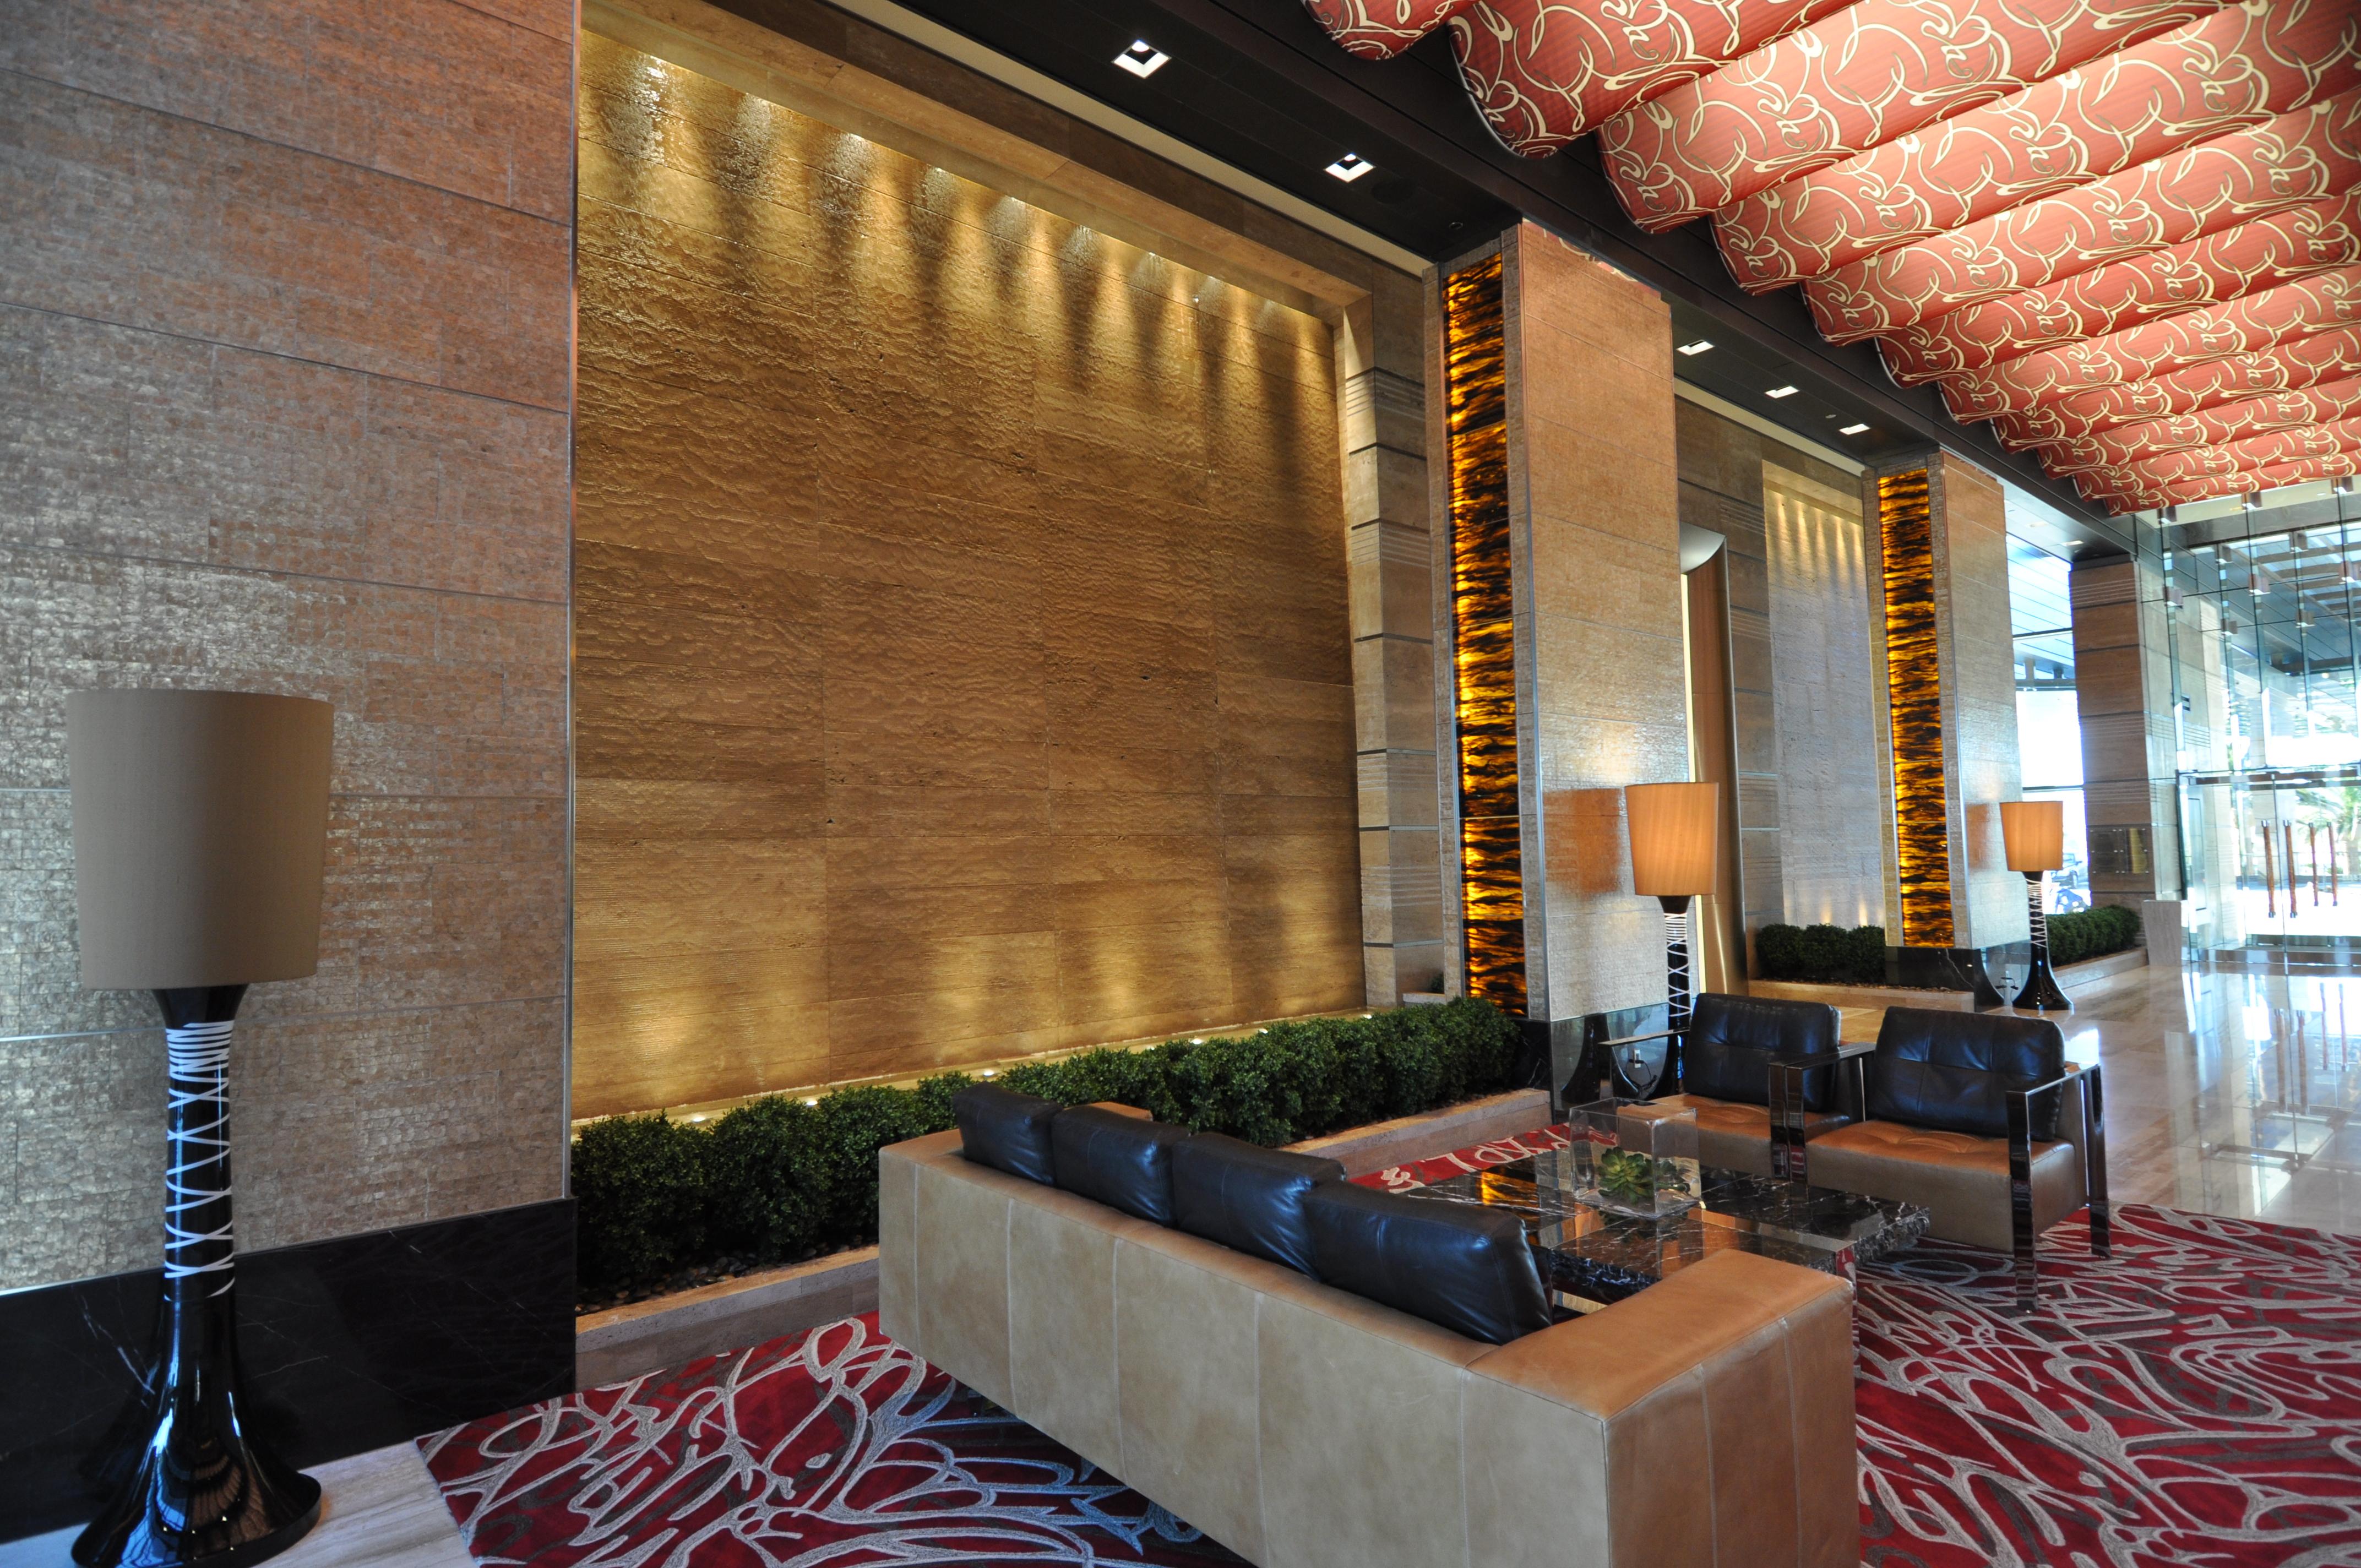 Lobby water wall at the M Resort Spa Casino, Las Vegas, NV.